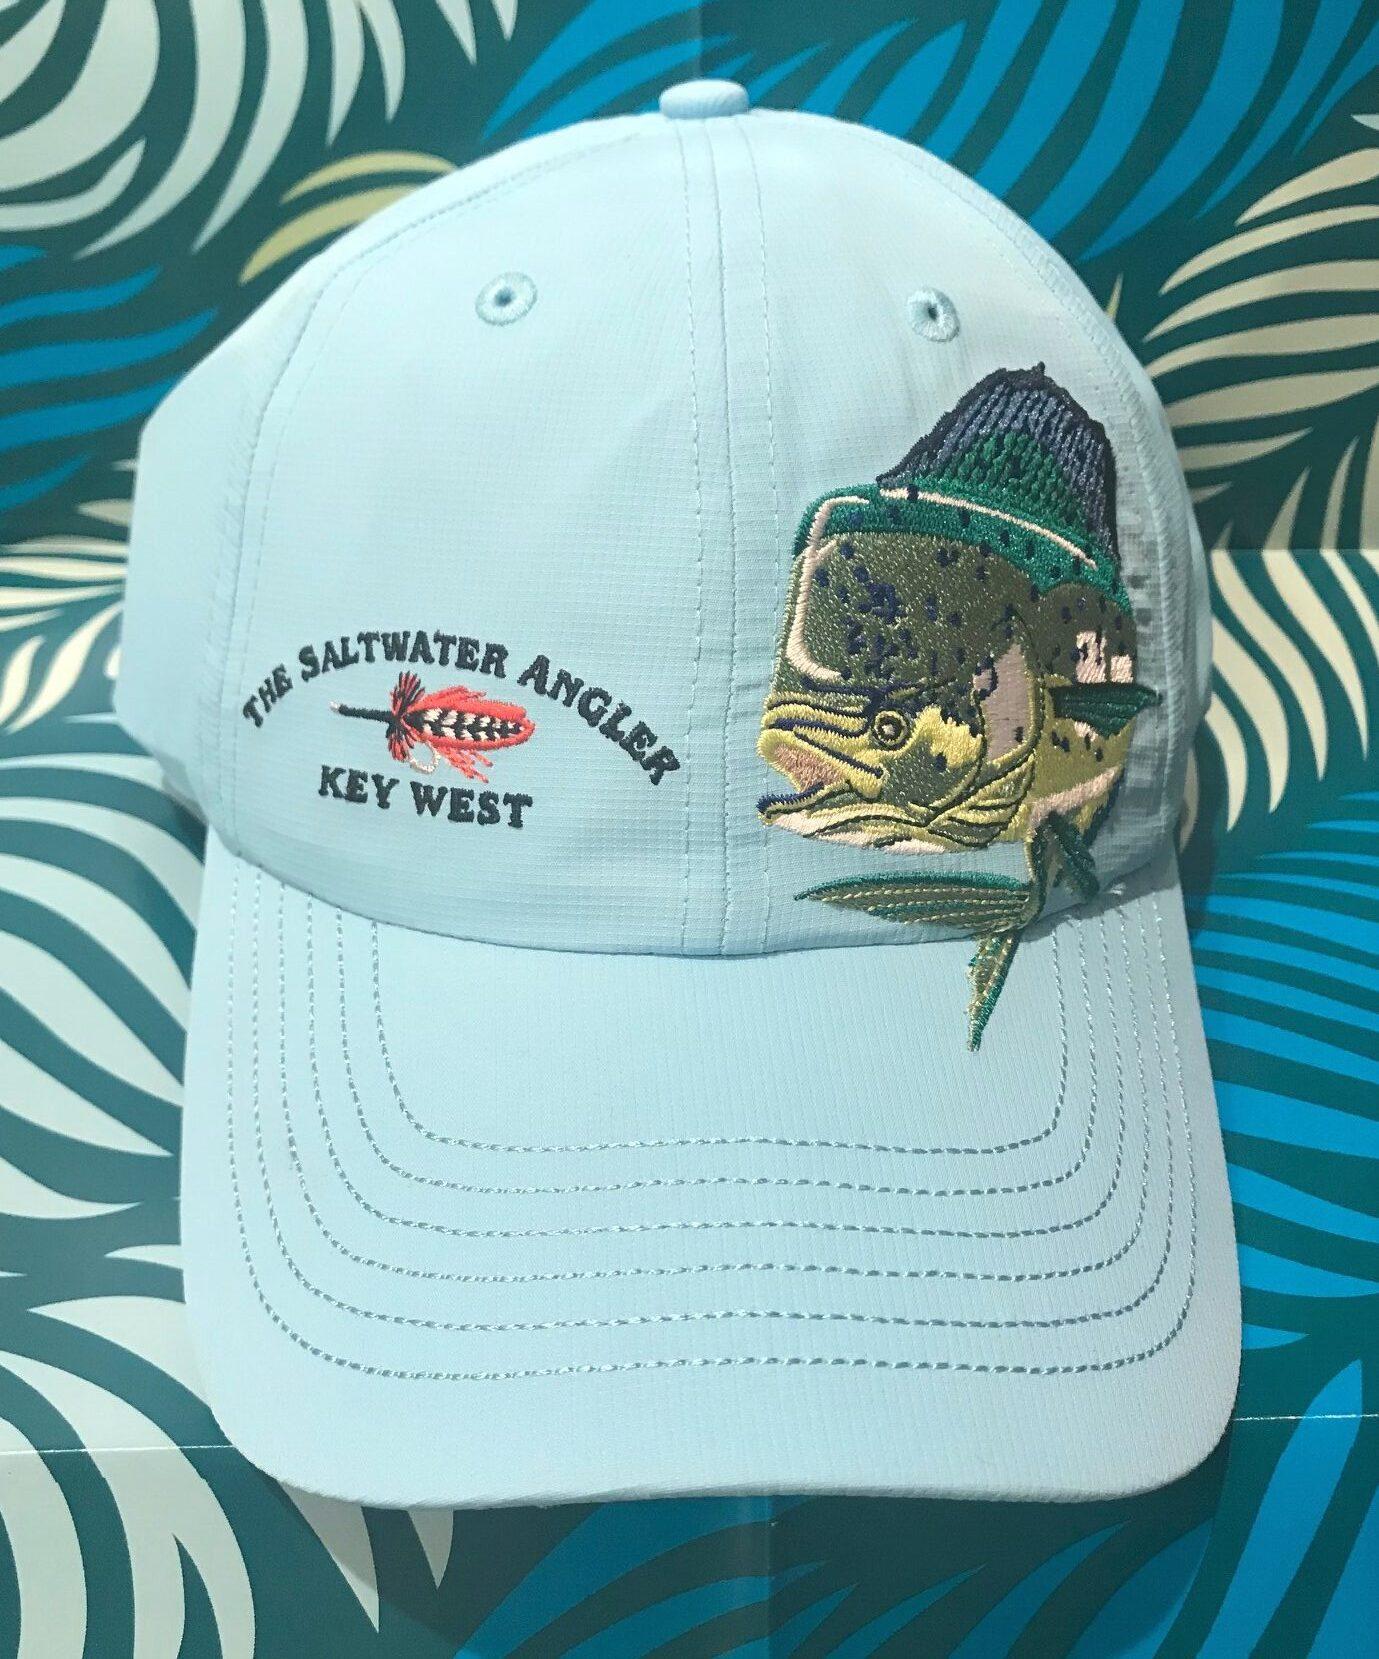 Saltwater Angler Mahi Performance Cap